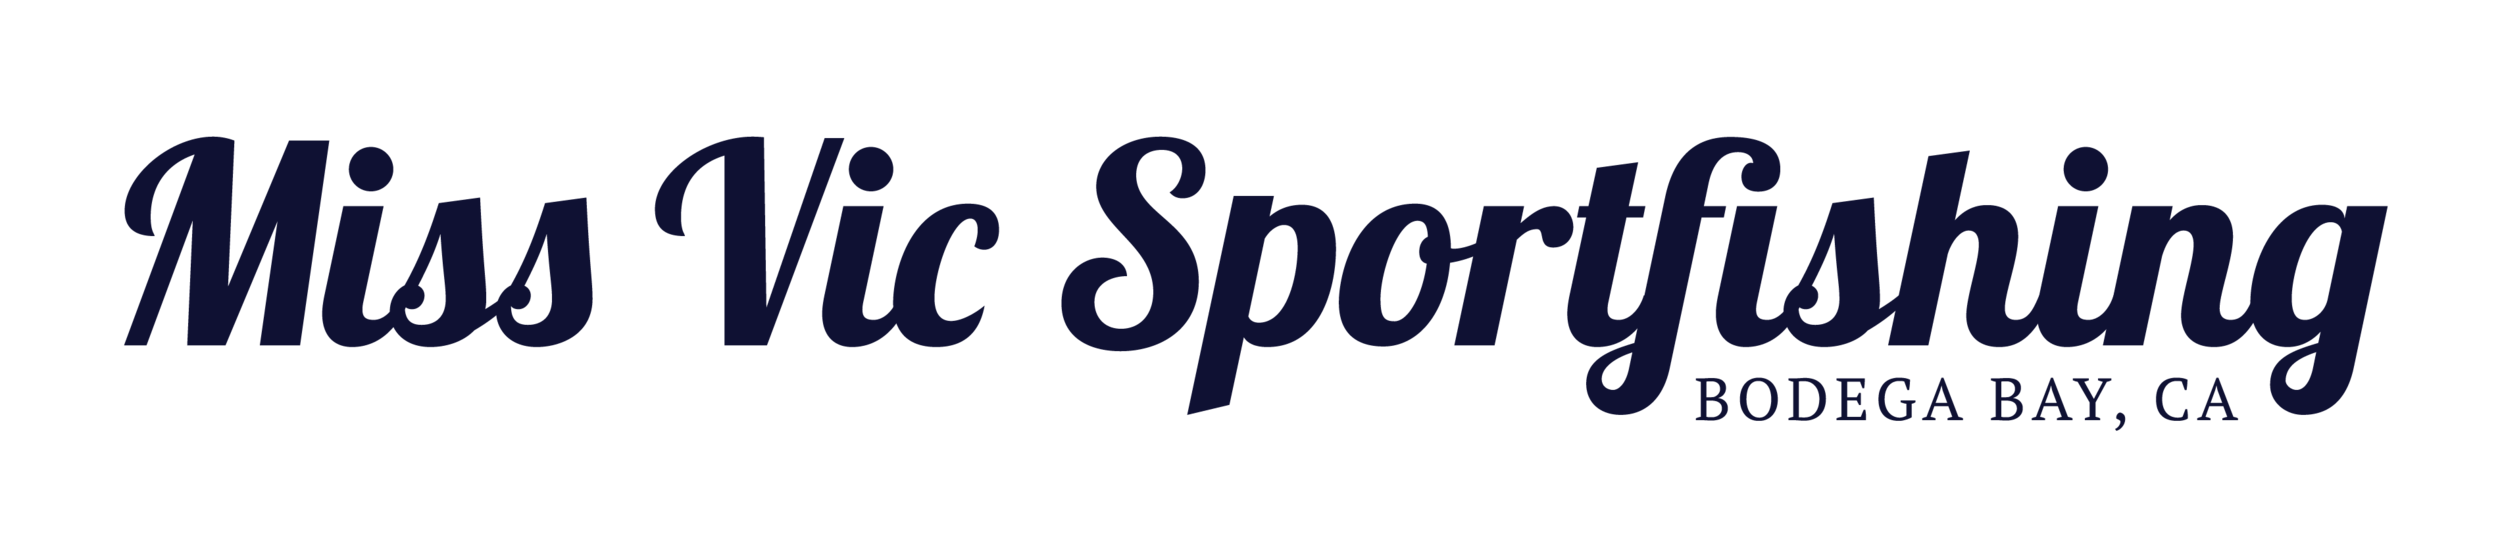 miss-vic-logo.png